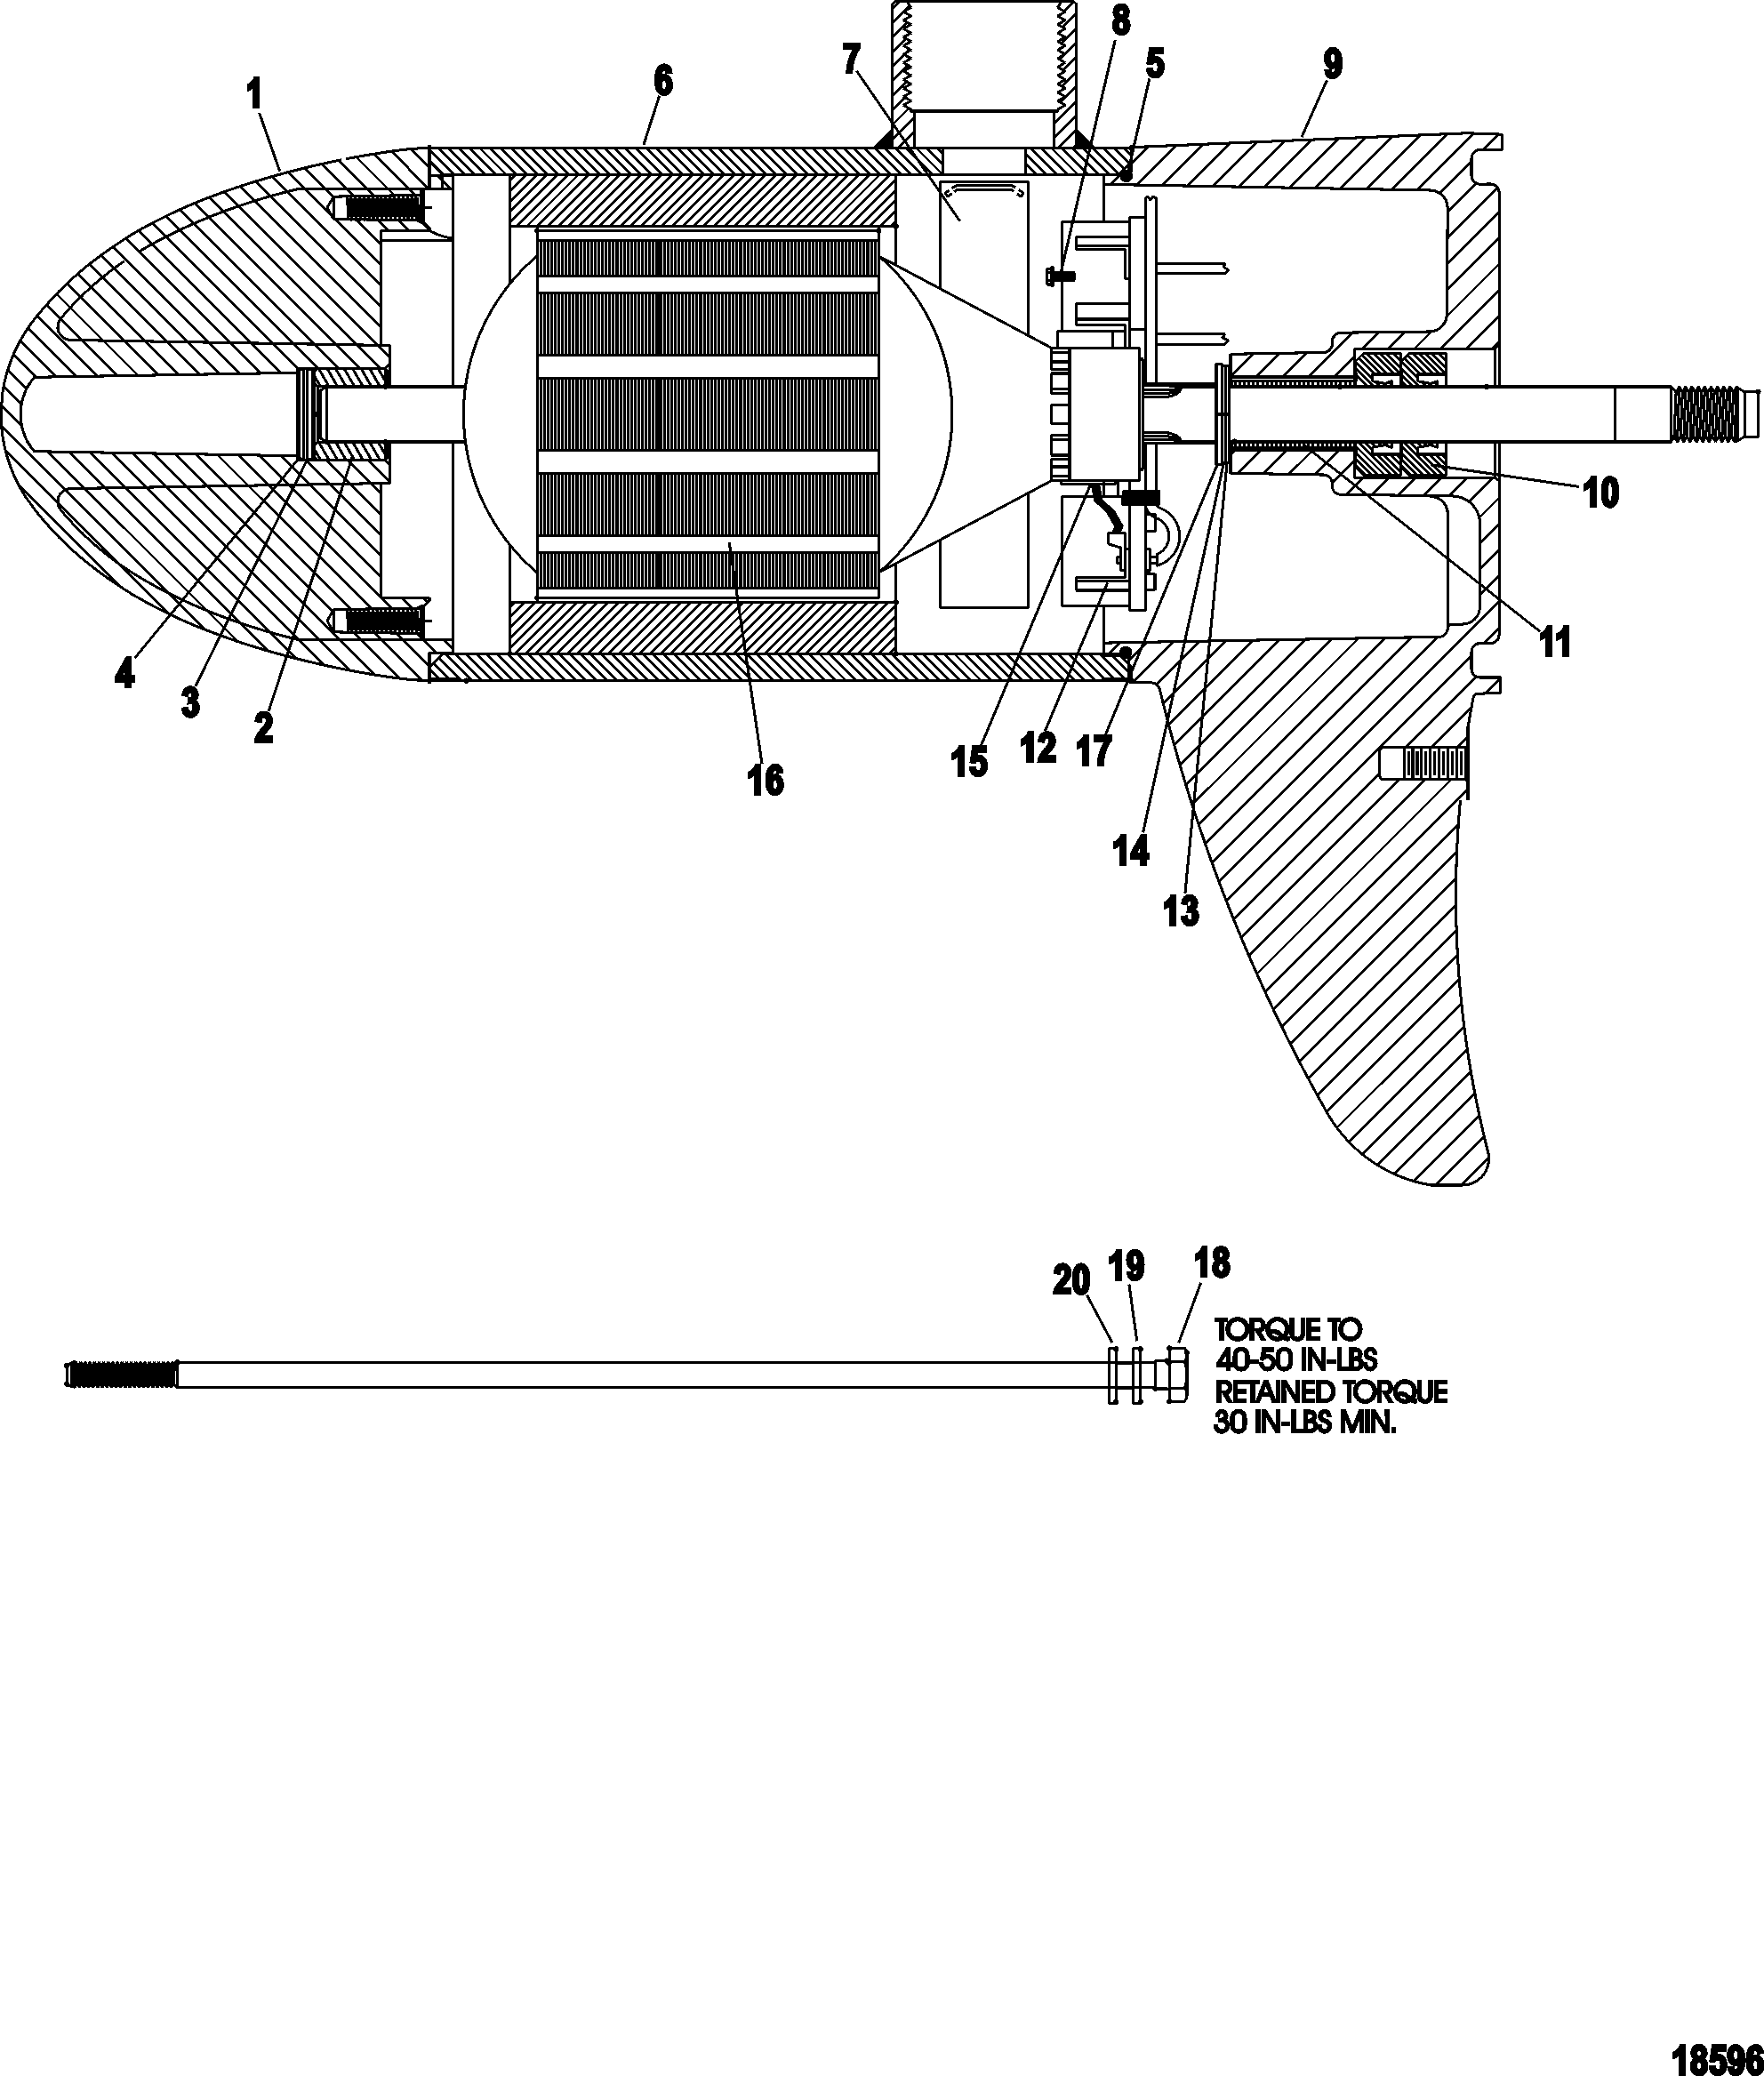 Trolling Motor Lower Unit Schematics Wiring Diagram Master Blogs Omc Schematic Motorguide Pro Series 9b000001 Up Rh Mercury Lakor Com